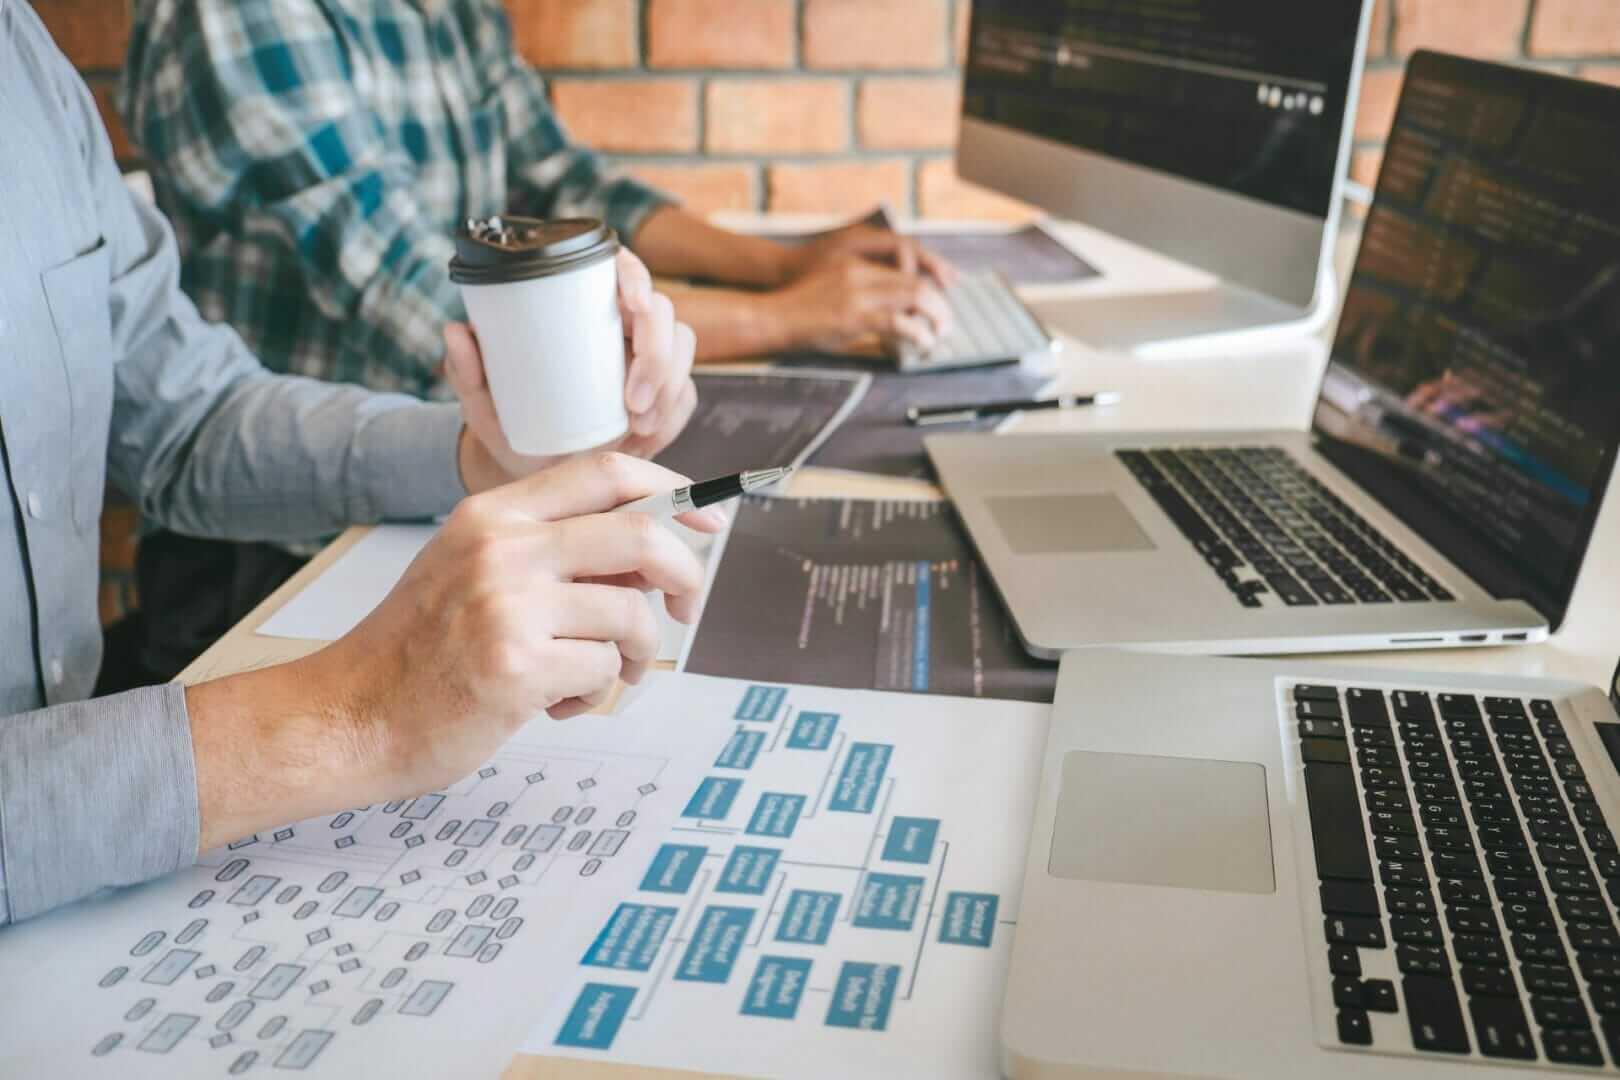 team-professional-developer-programmer-cooperation-meeting-brainstorming-programming-website-working-software-coding-technology